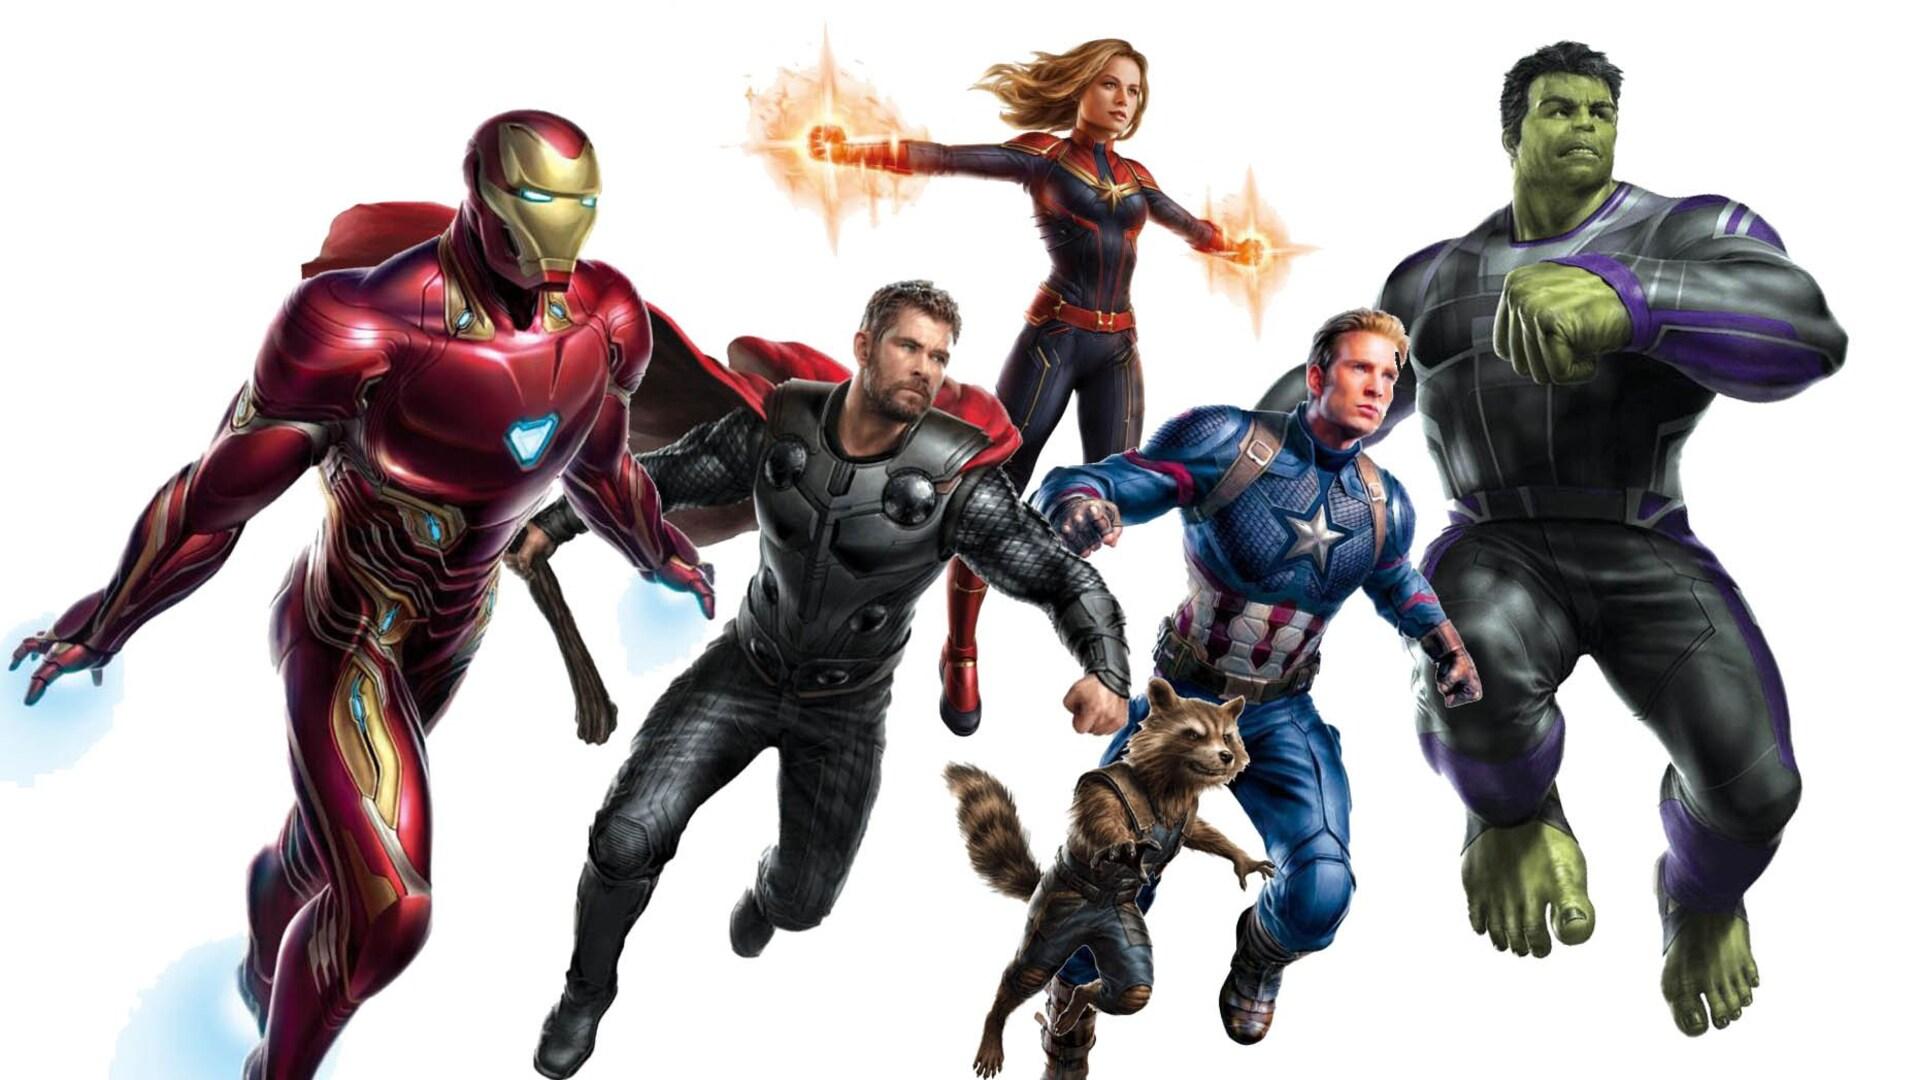 1920x1080 Avengers 4 2019 Movie Laptop Full Hd 1080p Hd 4k